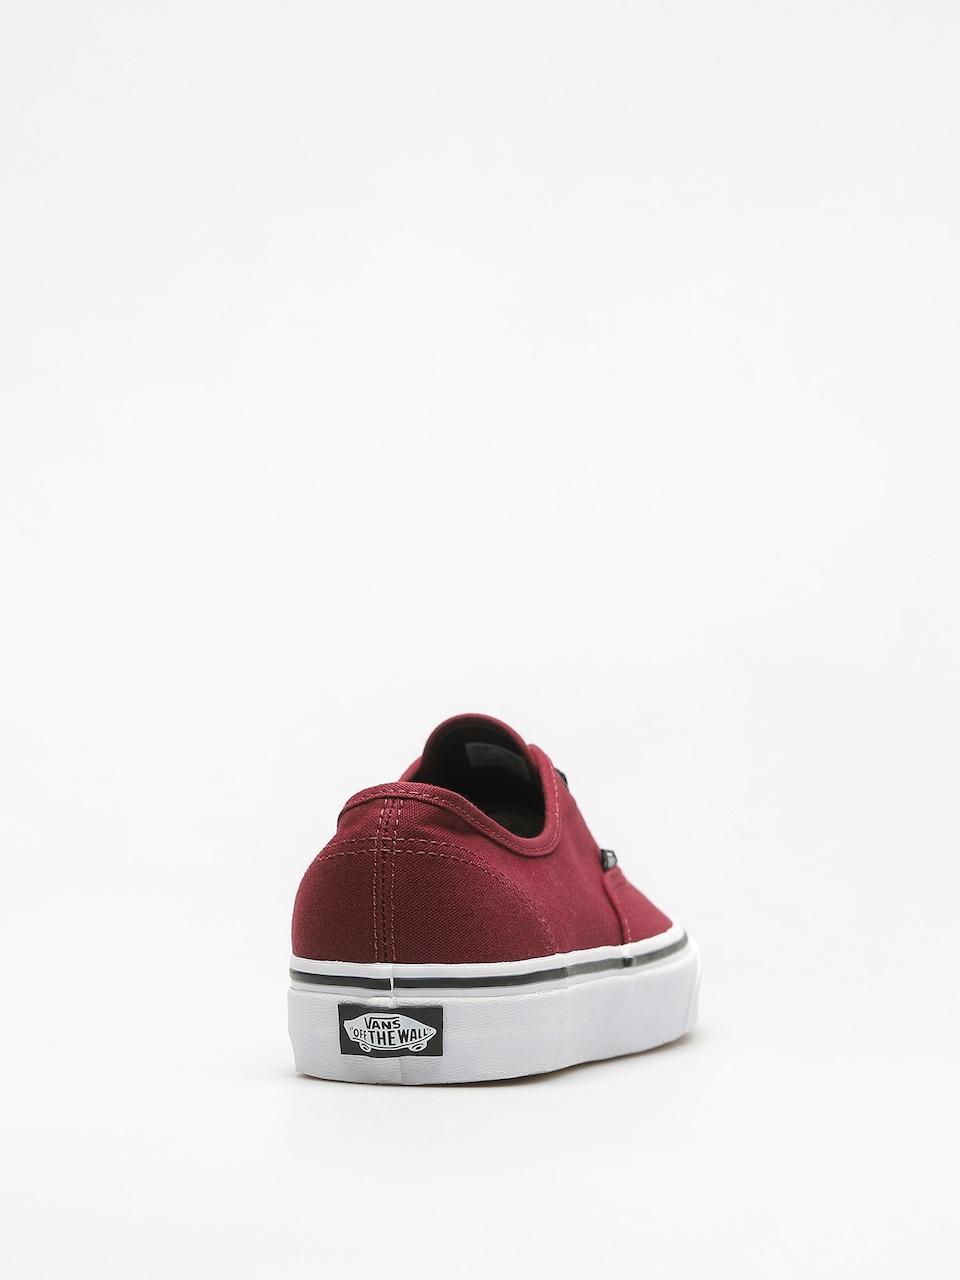 Vans Authentic Sneakers Port RoyalBlack